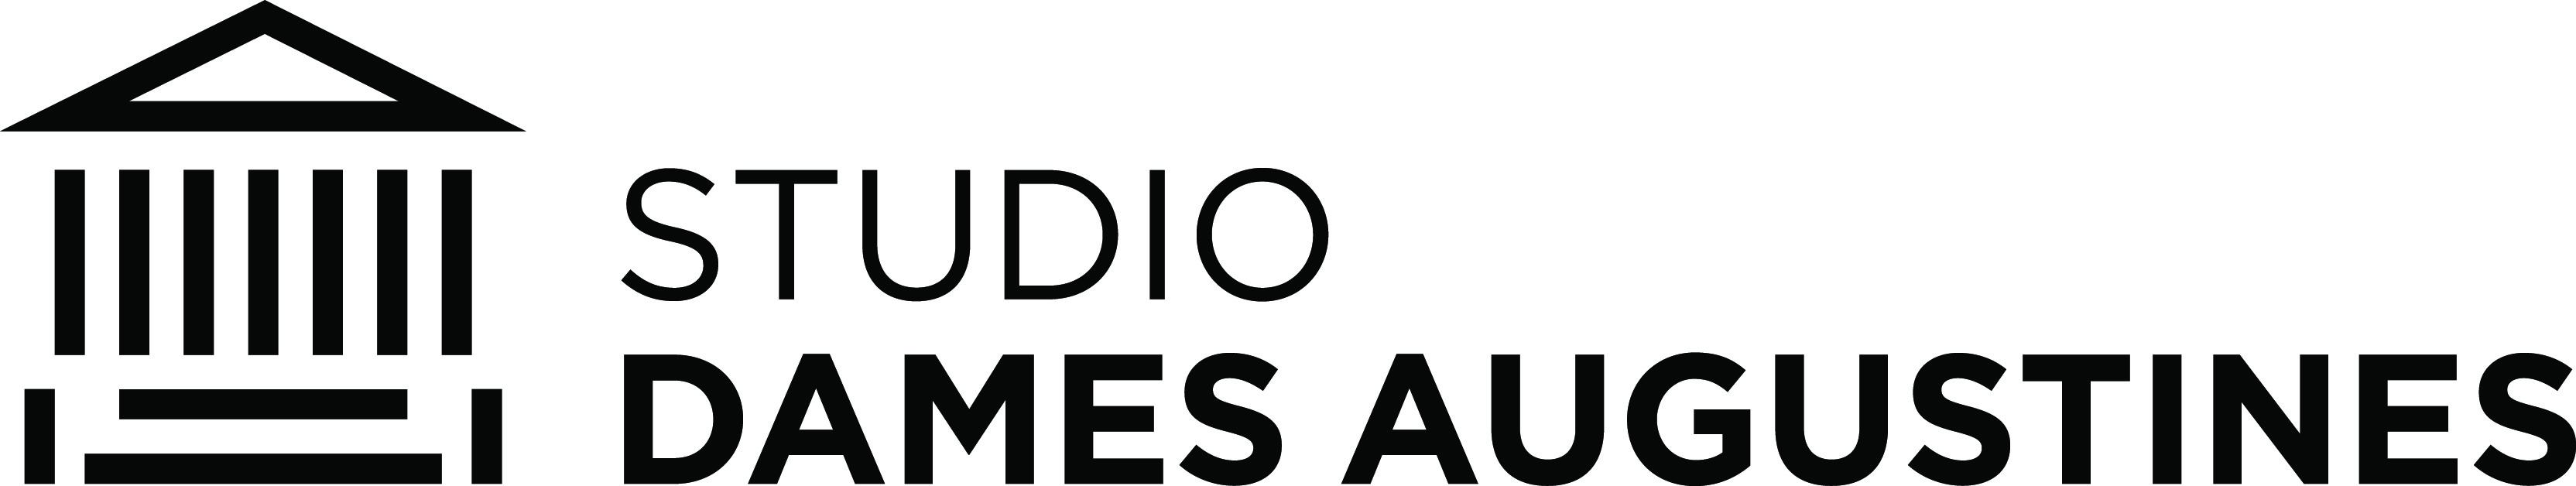 STUDIO DES DAMES AUGUSTINES